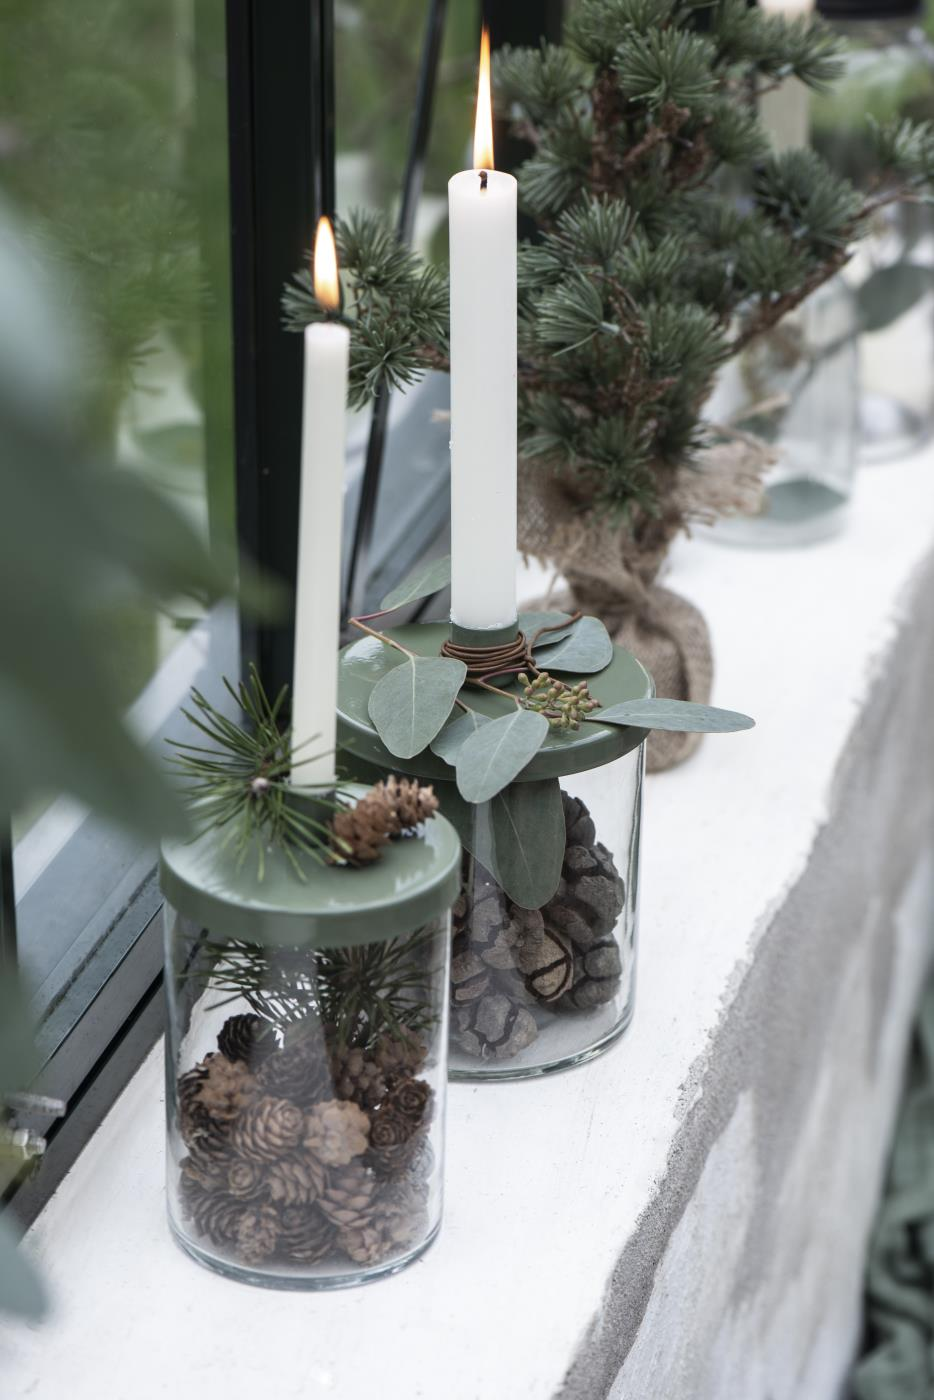 Kerzenhalter mit Metalldeckel